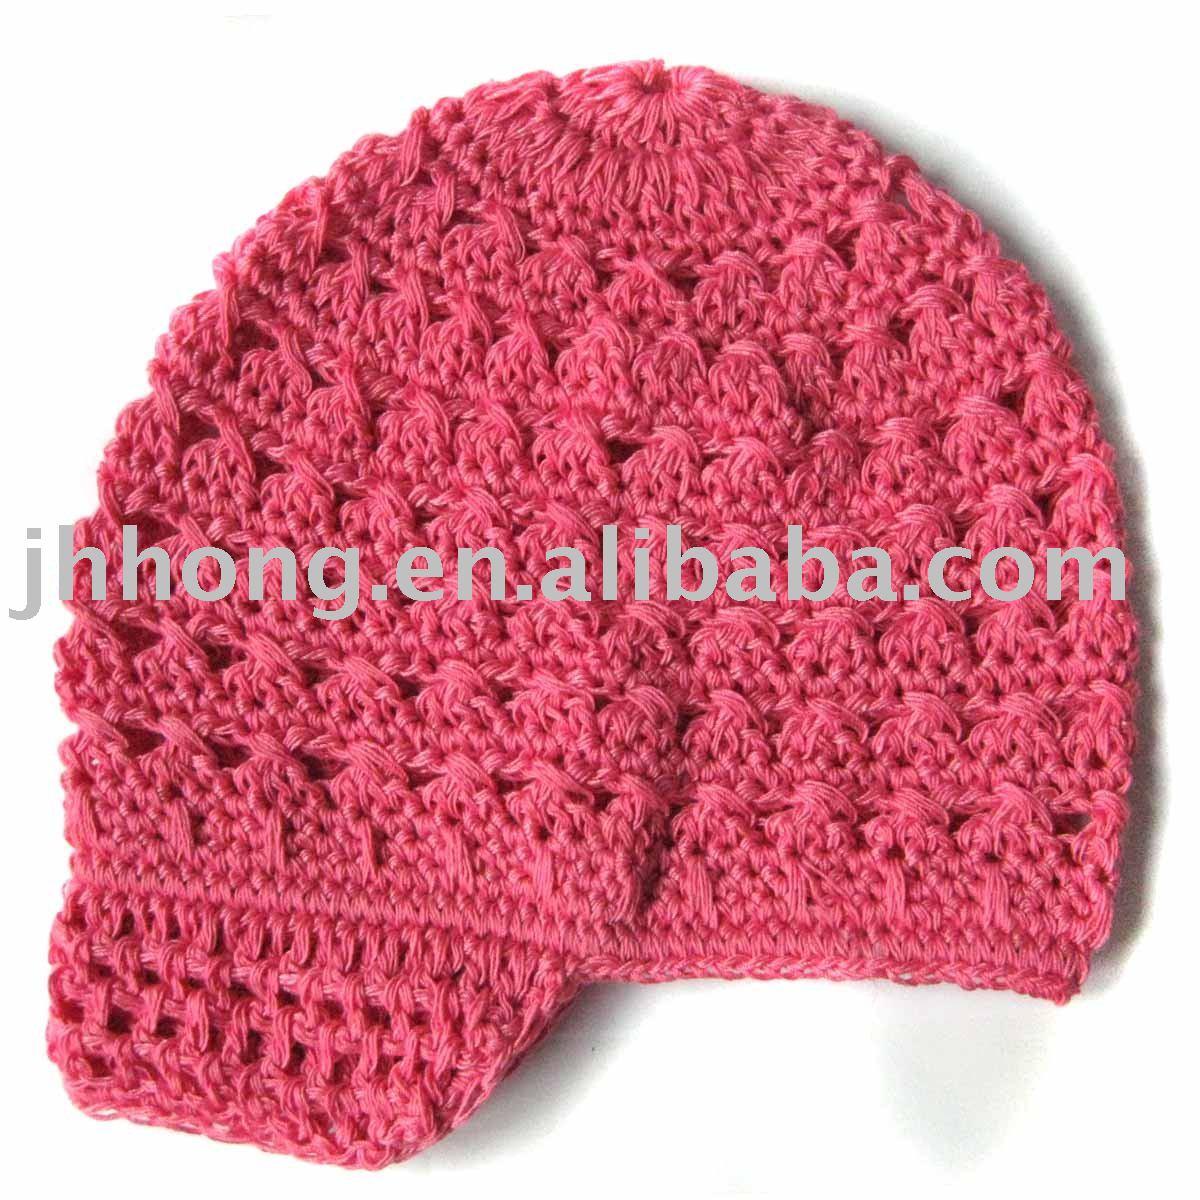 Free crochet patterns kufi hat manet for free kufi beanie hat crochet pattern images bankloansurffo Choice Image